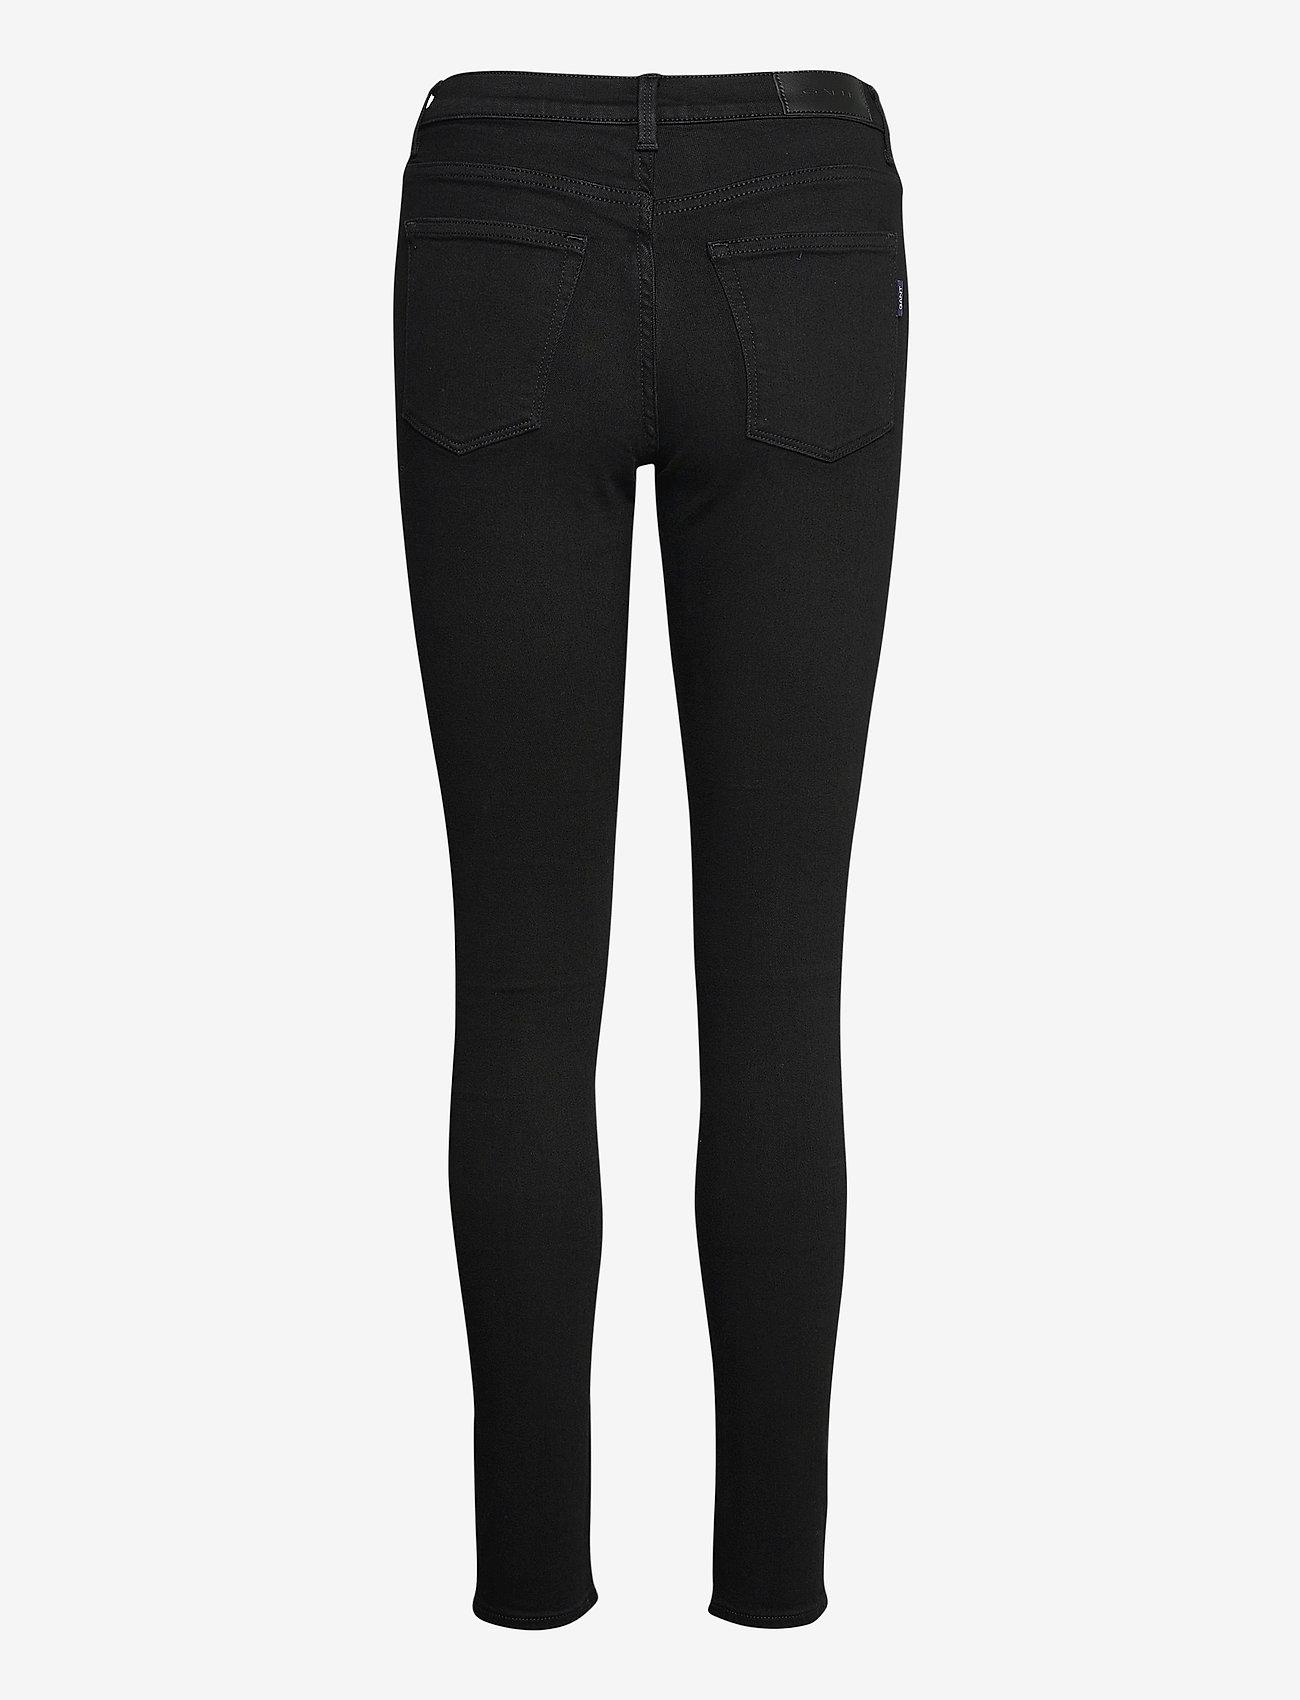 GANT - SKINNY SUPER STRETCH JEANS - skinny jeans - black - 1